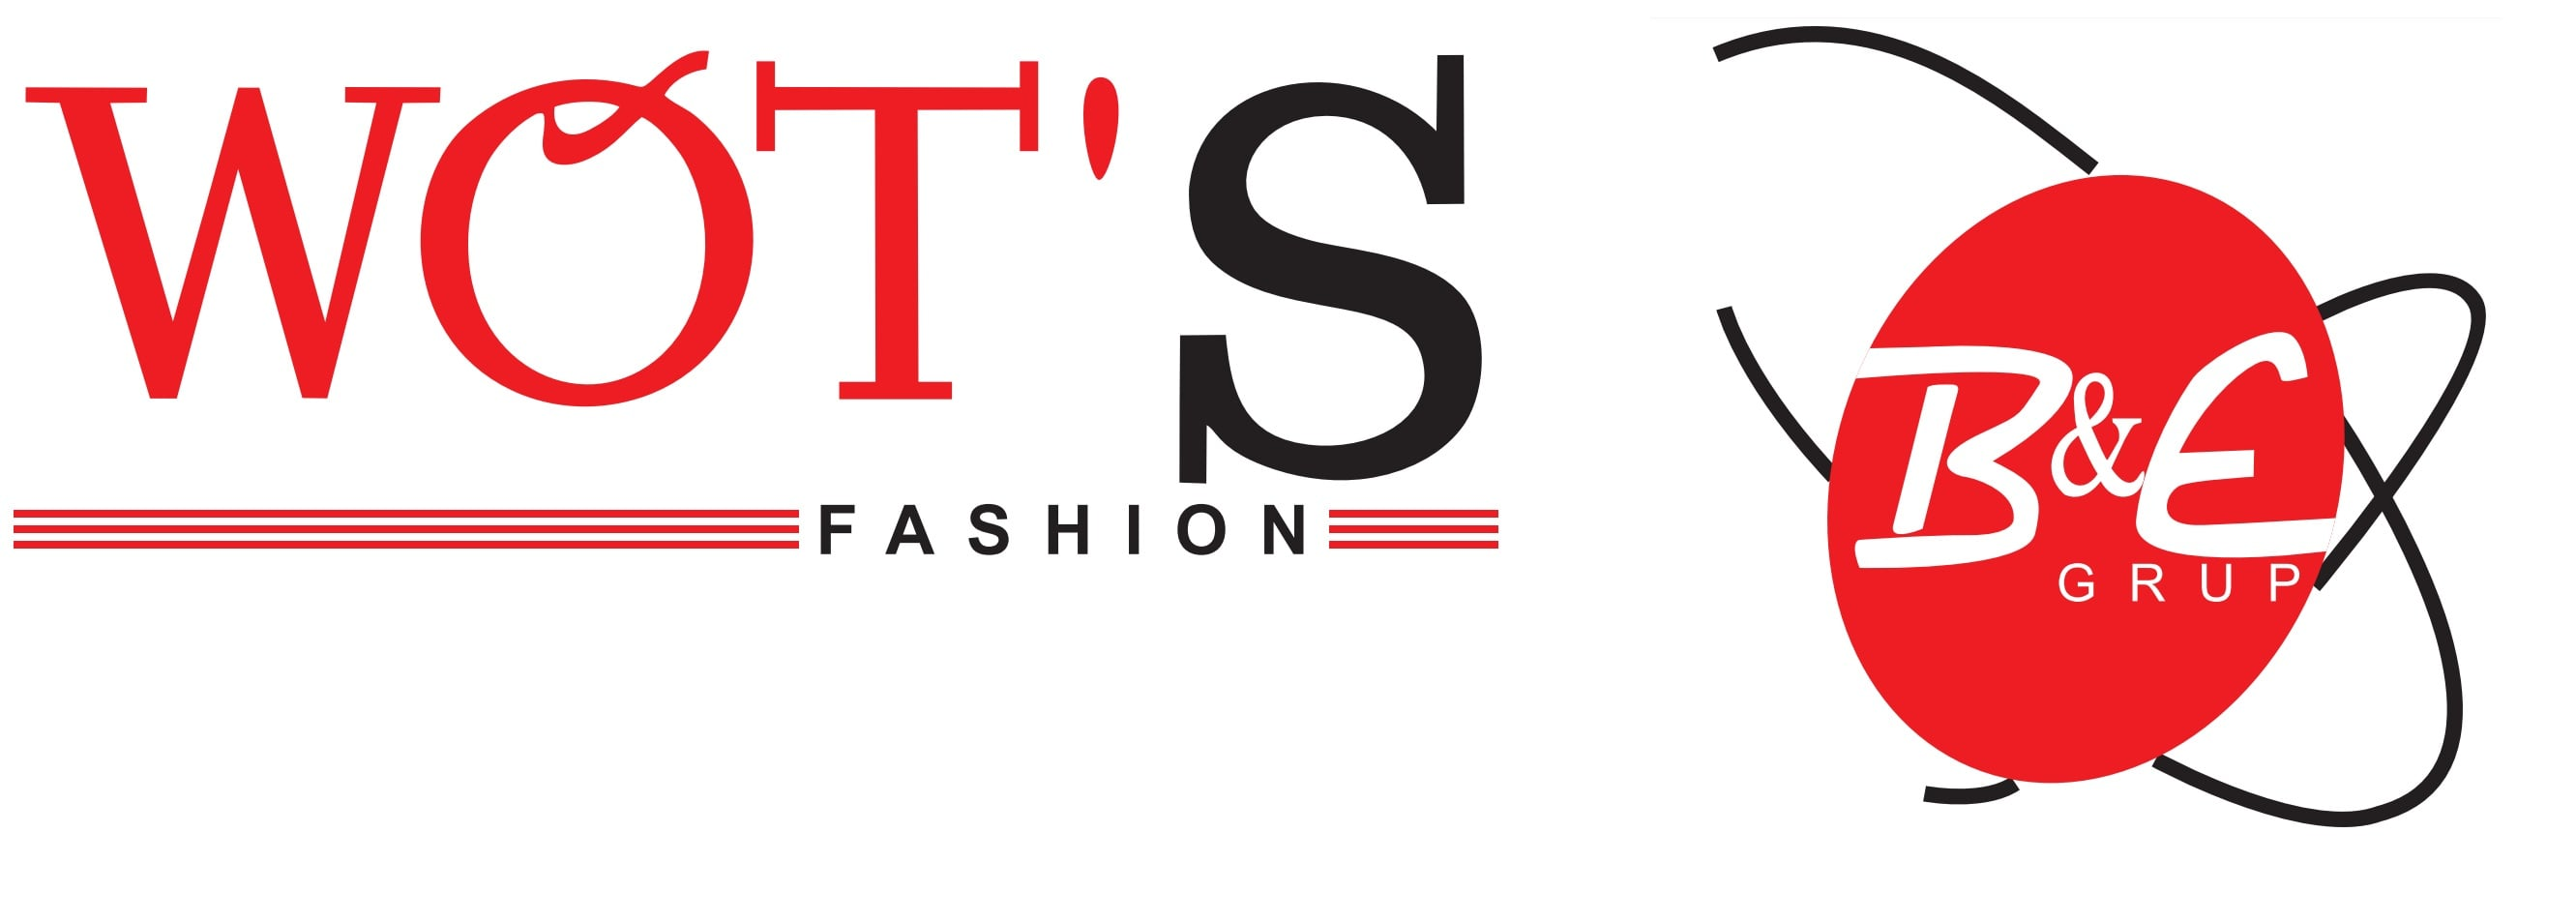 WOT'S Fashion